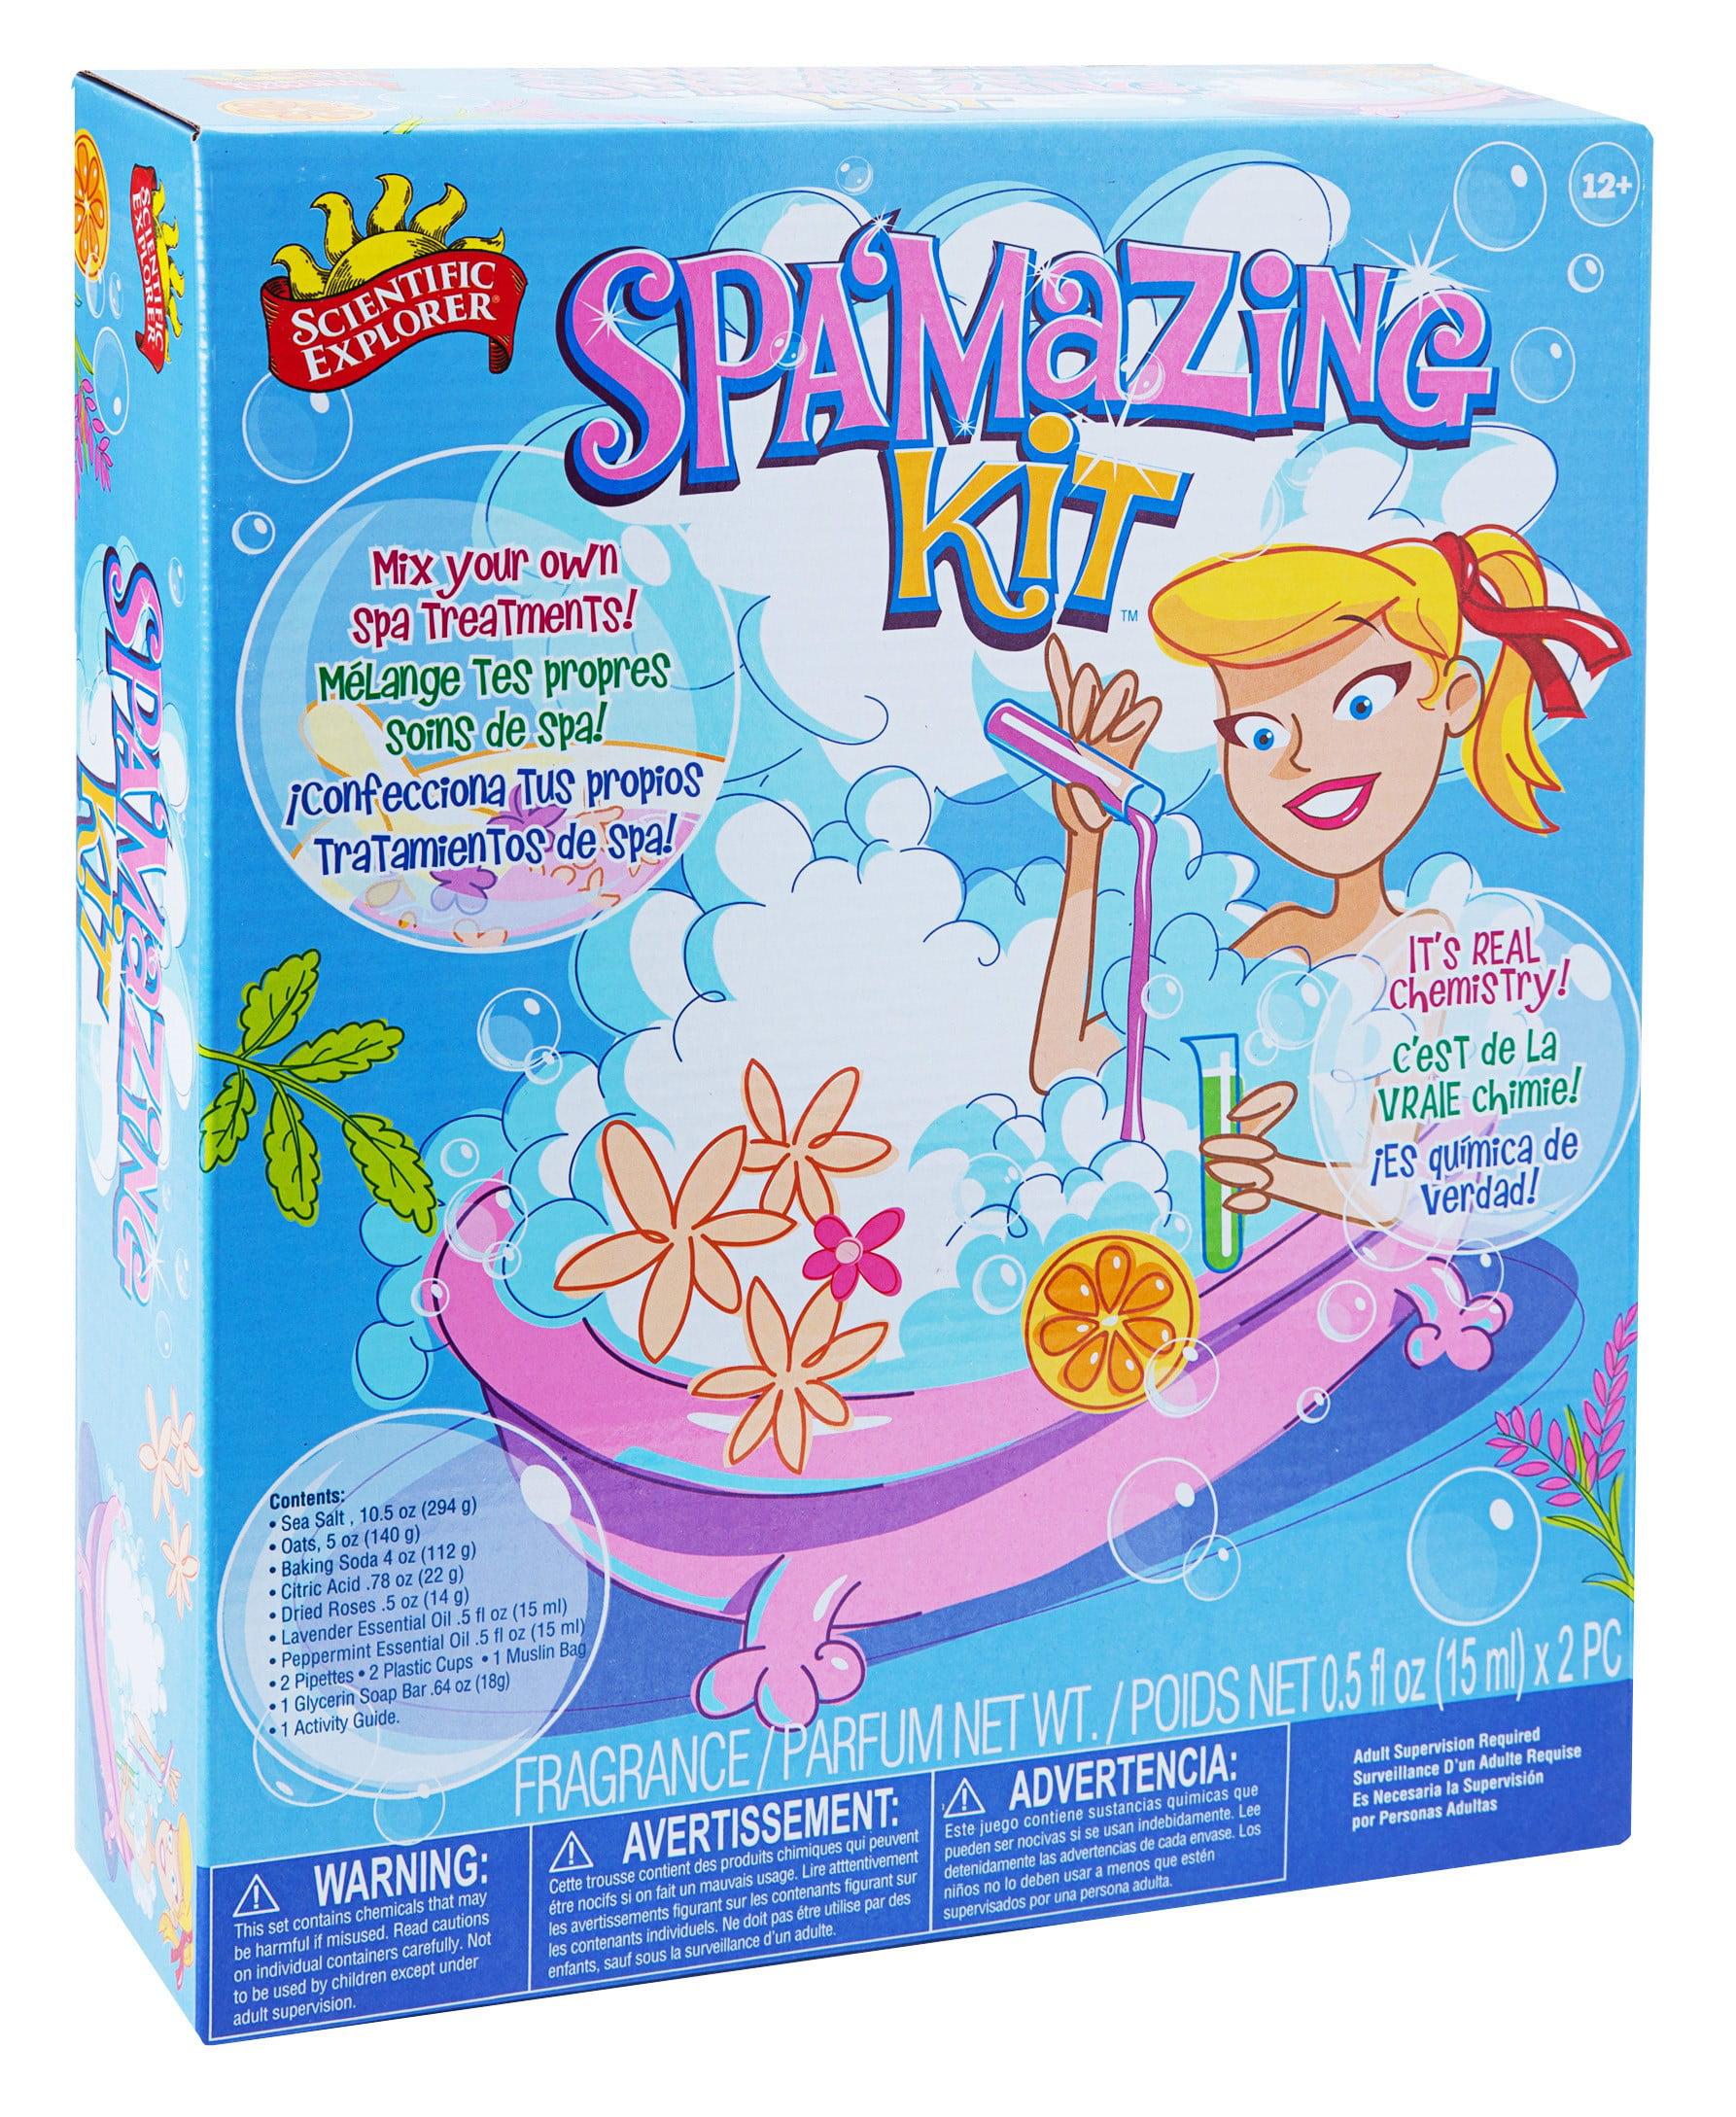 Spa Science Kit Walmart